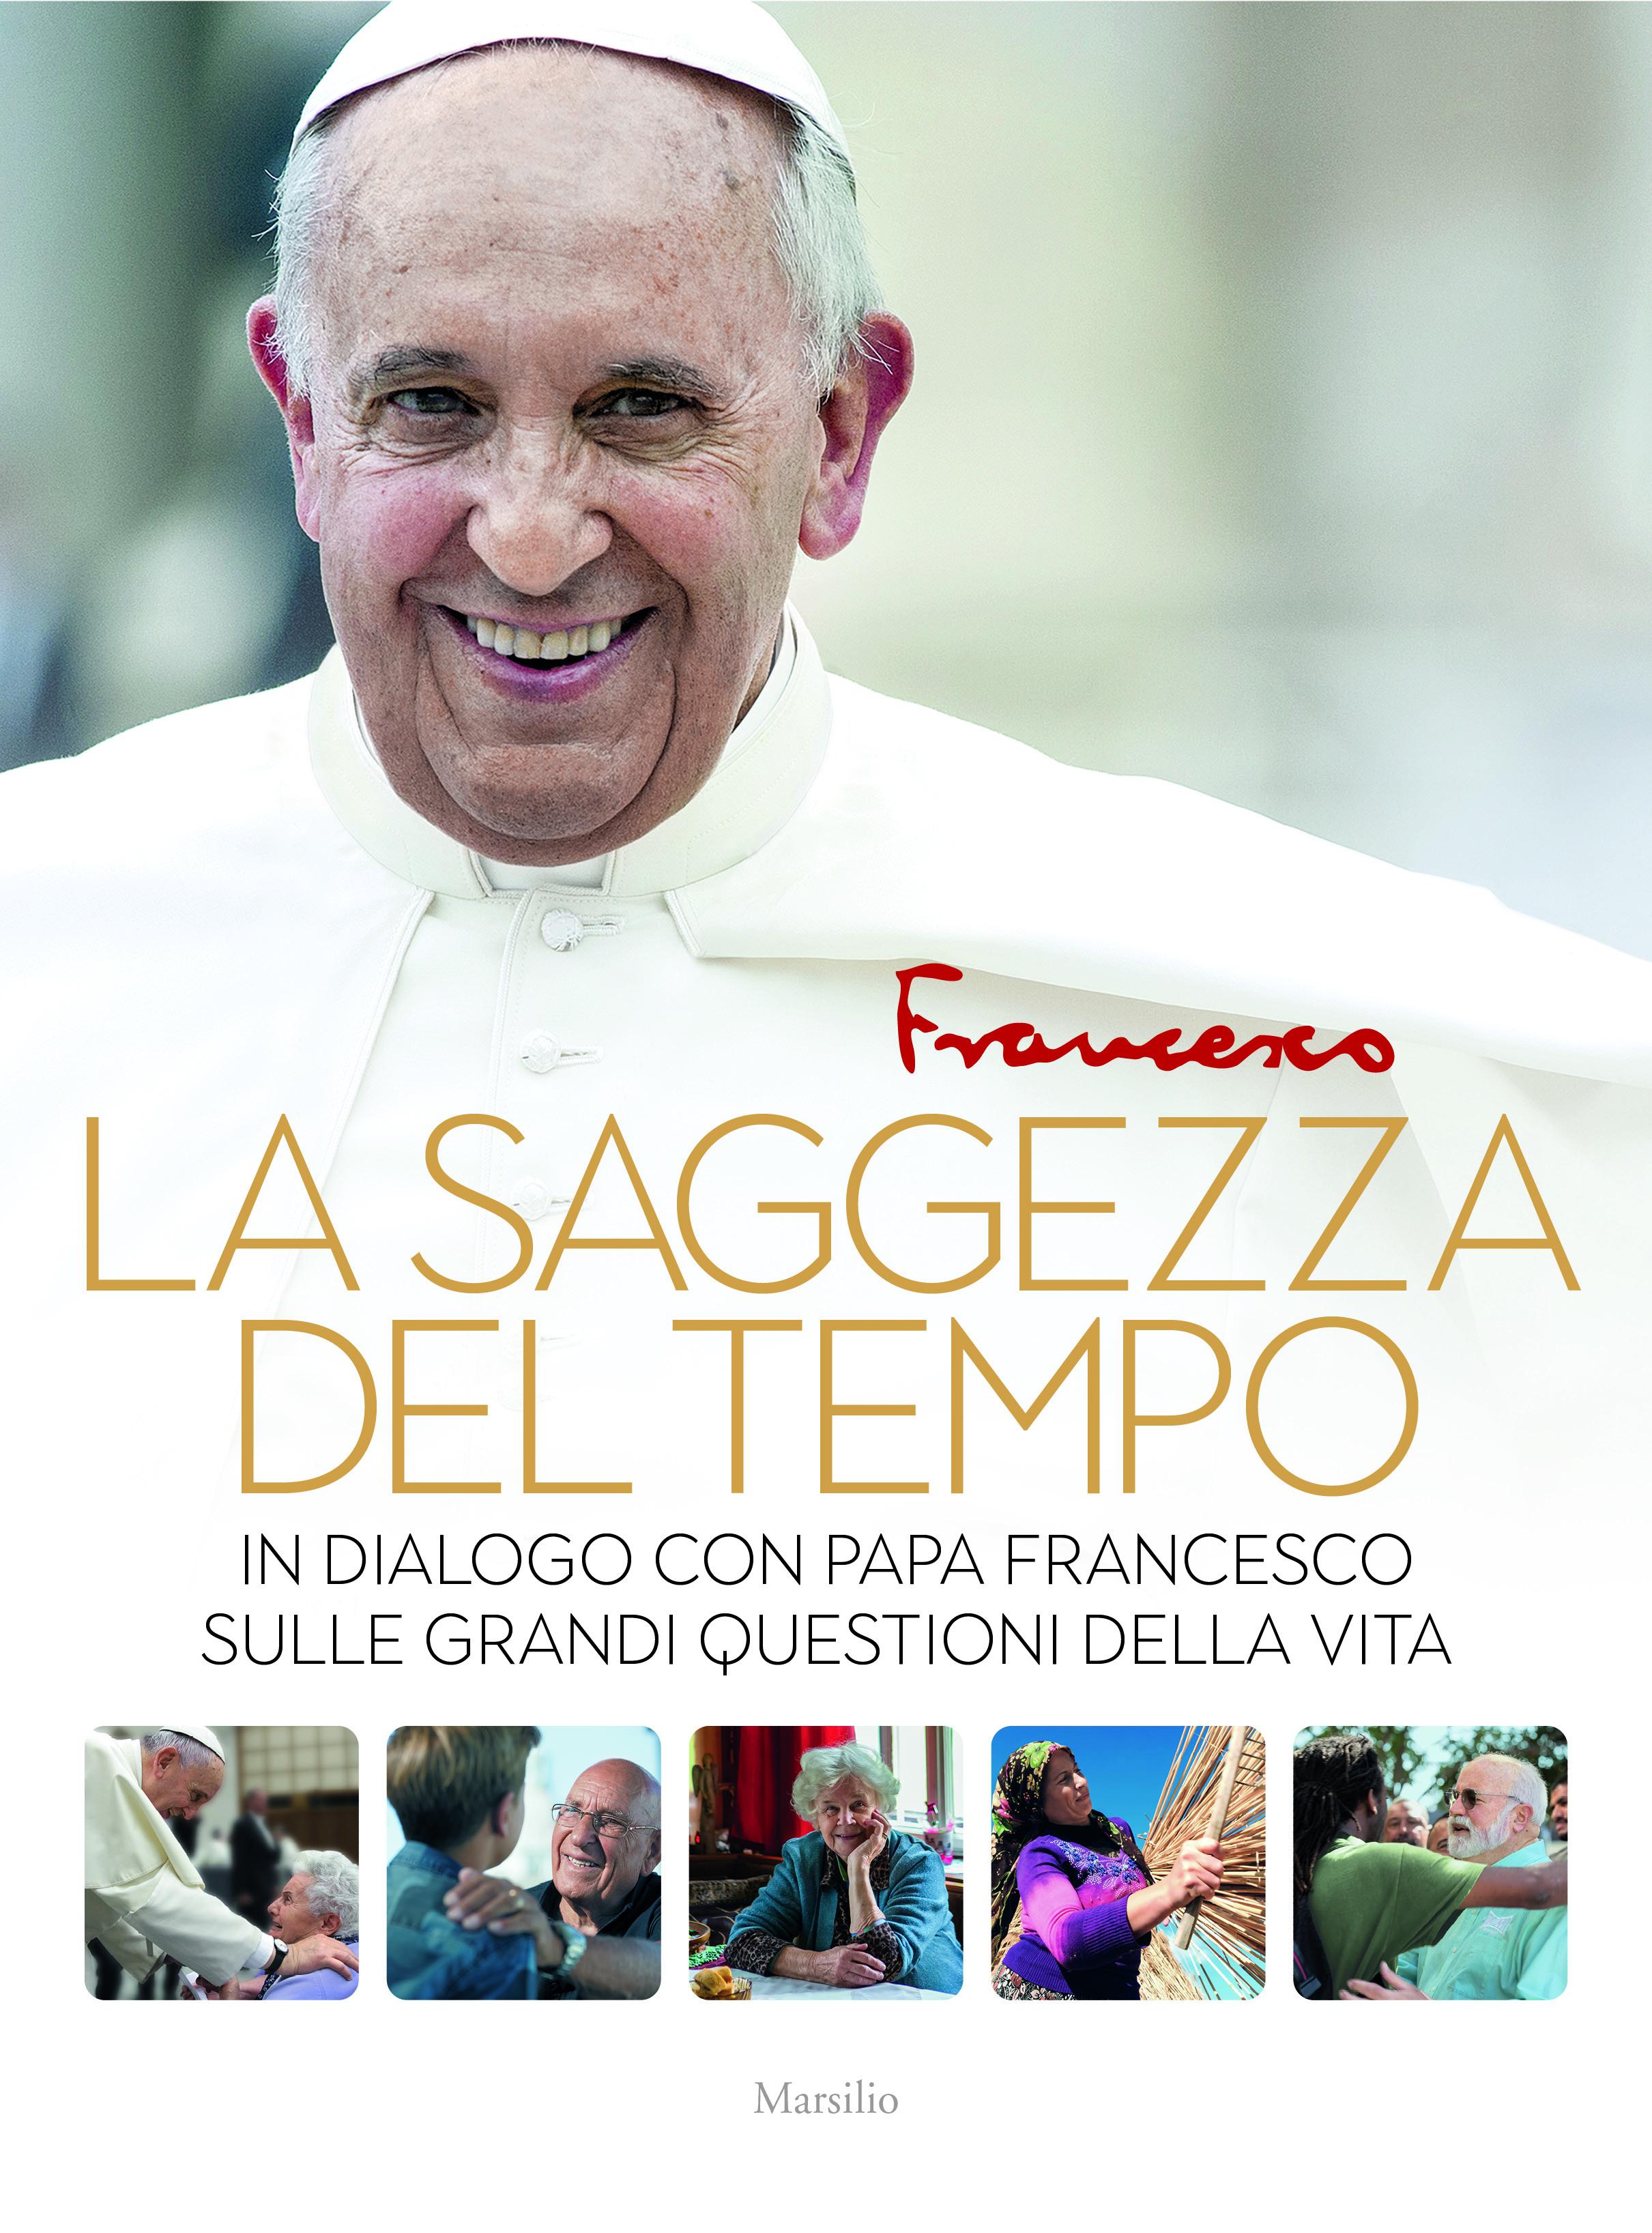 Cover_Francesco_Lasaggezzadeltempo